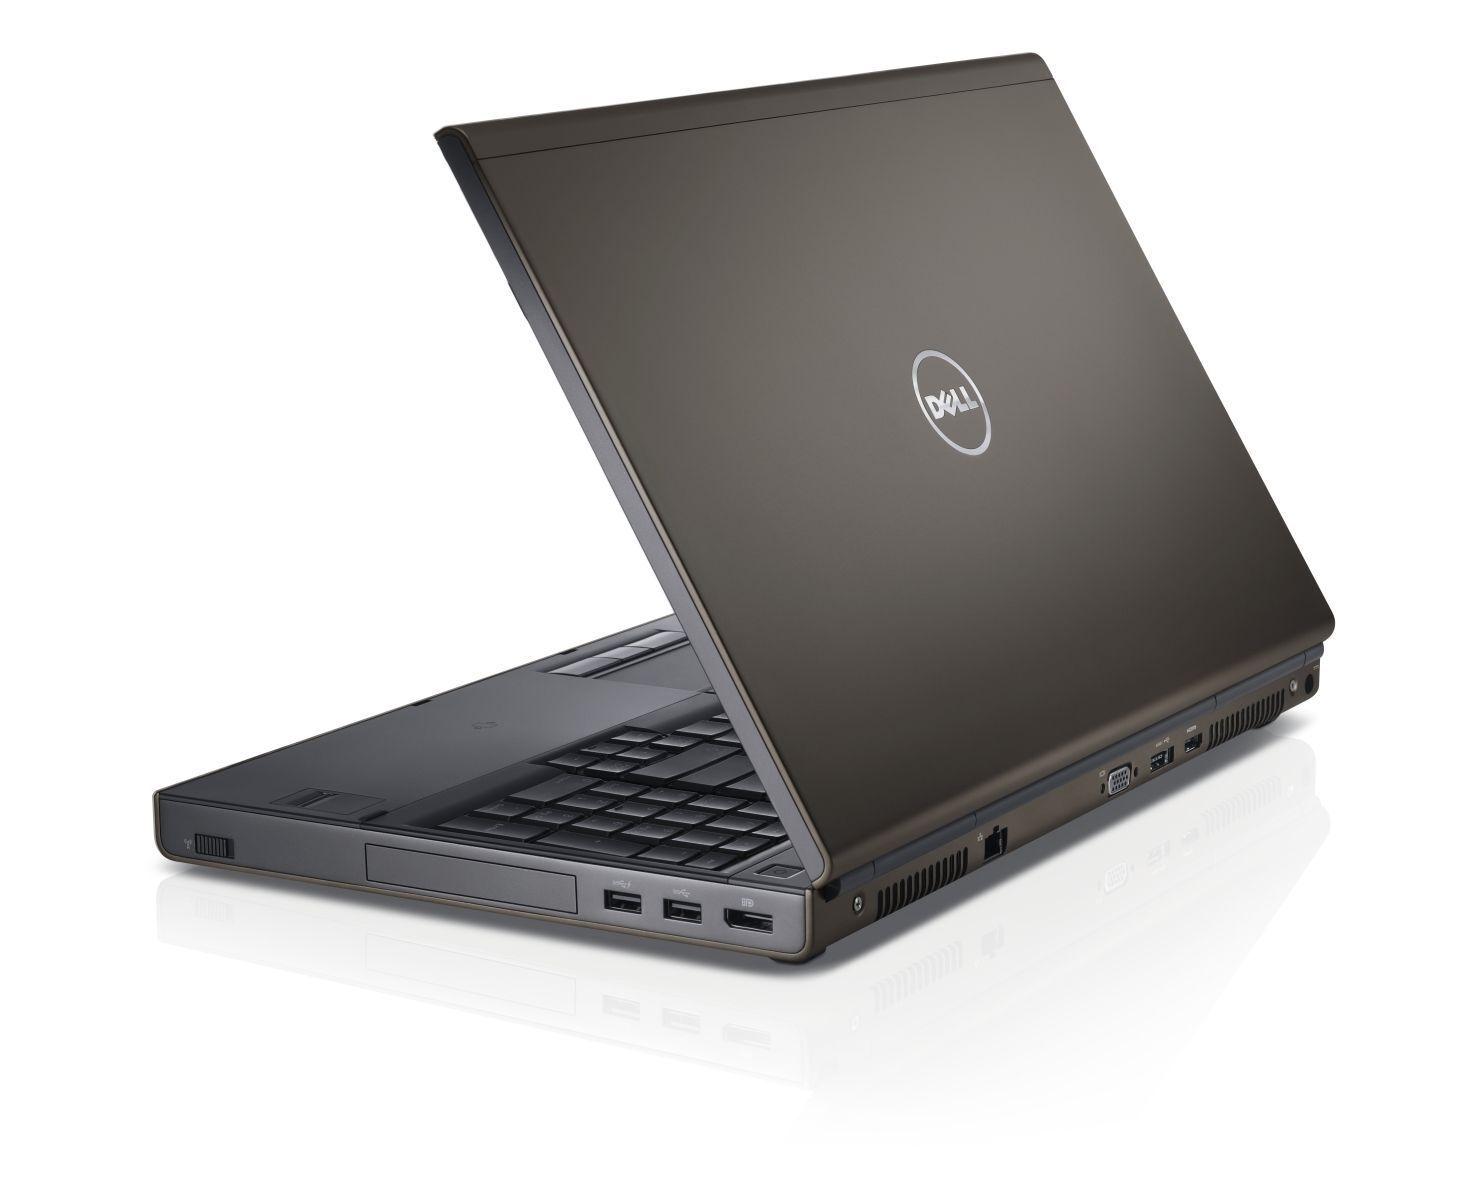 Dell Precision M4800 1080P i7-4800MQ 16GB 1TB SSHD Webcam Bluetooth K1100M #5